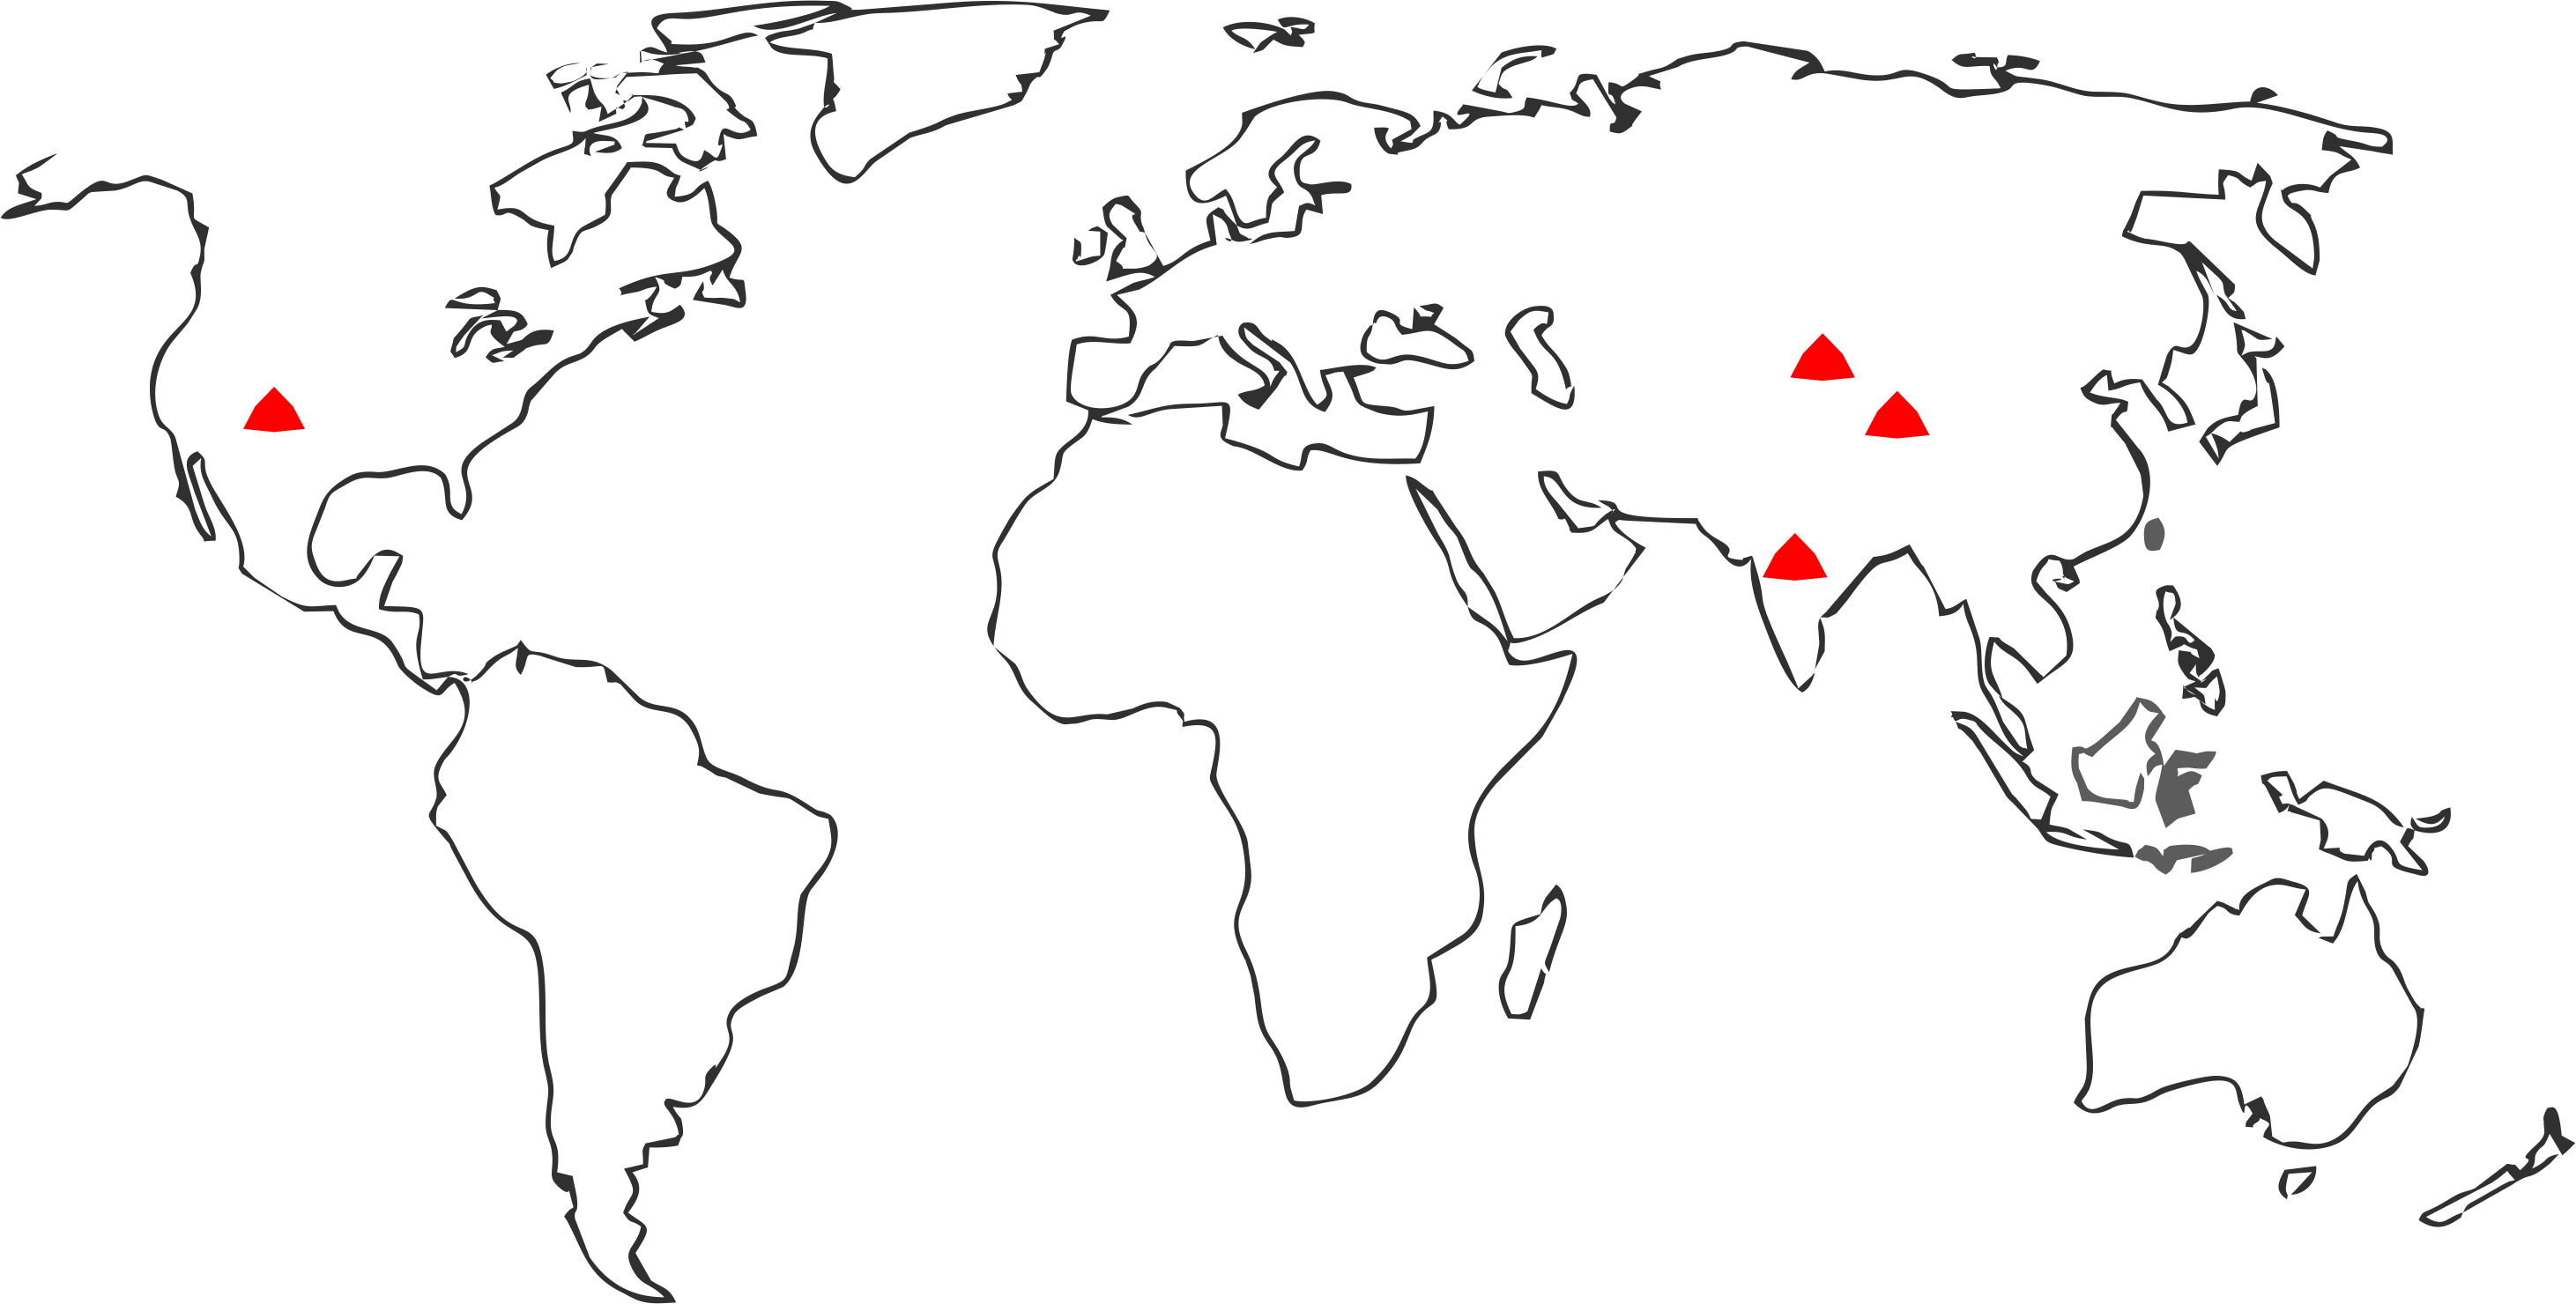 https://www.maheshwariandco.us/wp-content/uploads/2021/03/world-map.png